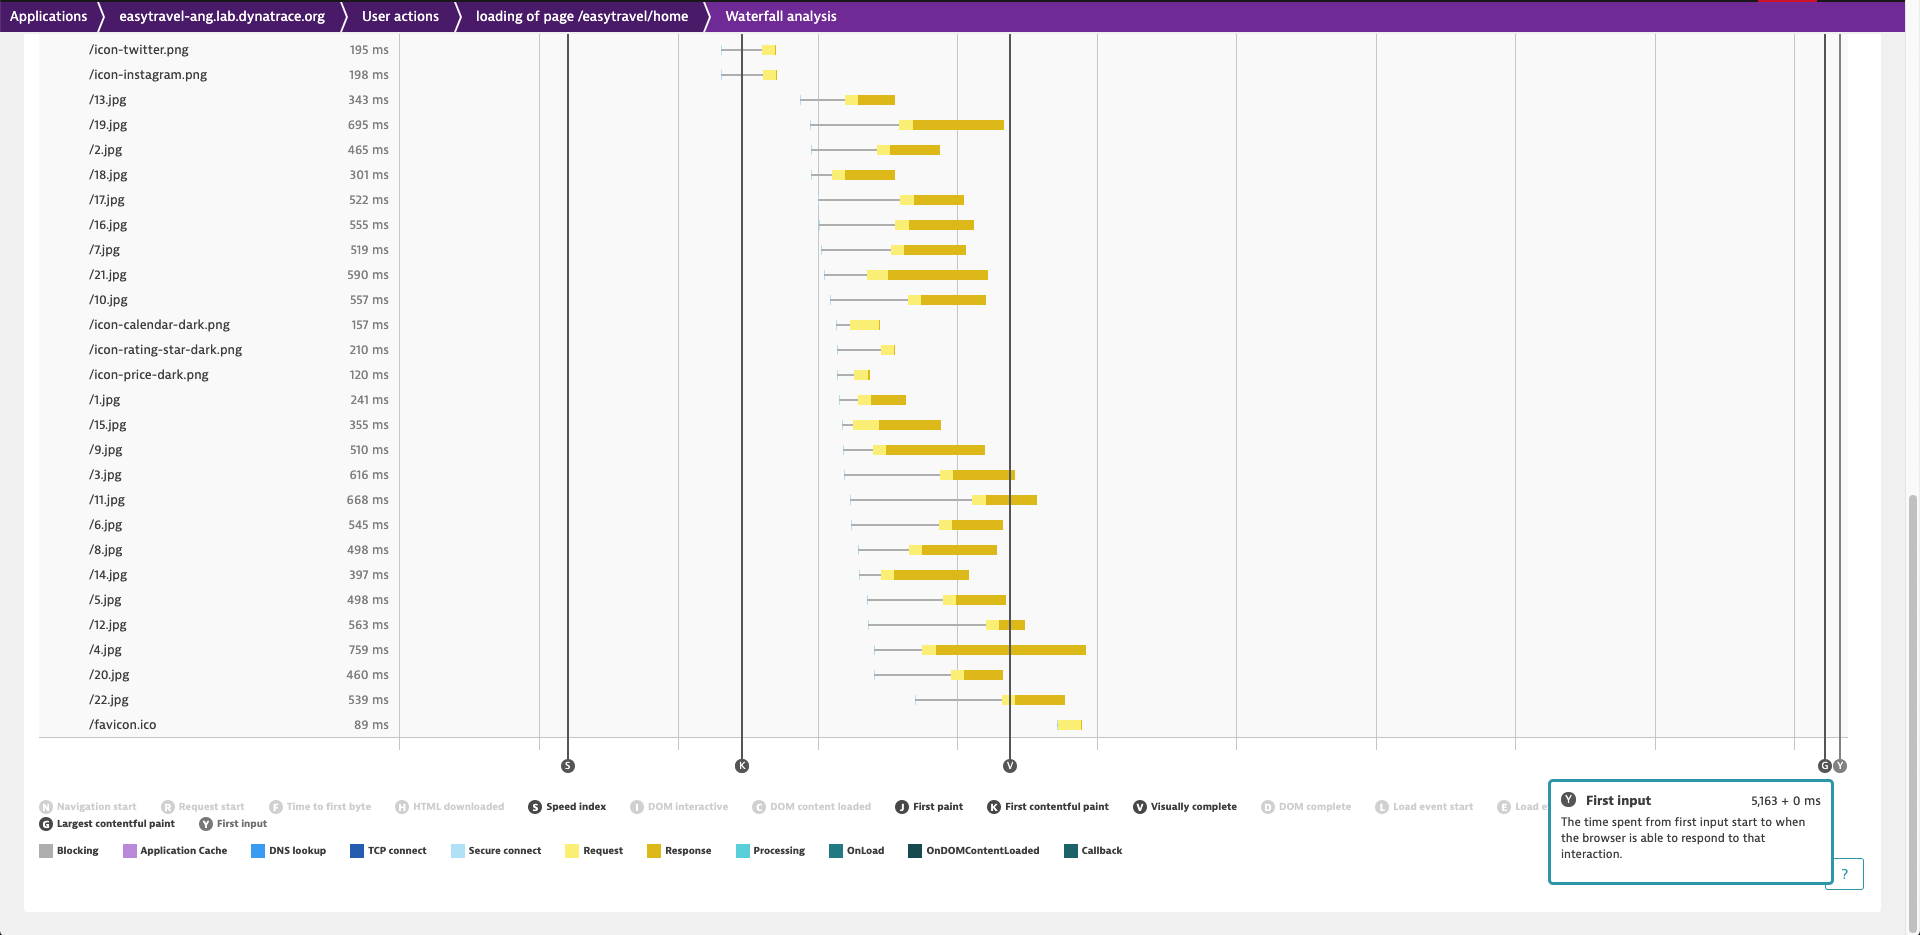 New web performance metrics in the waterfall analysis